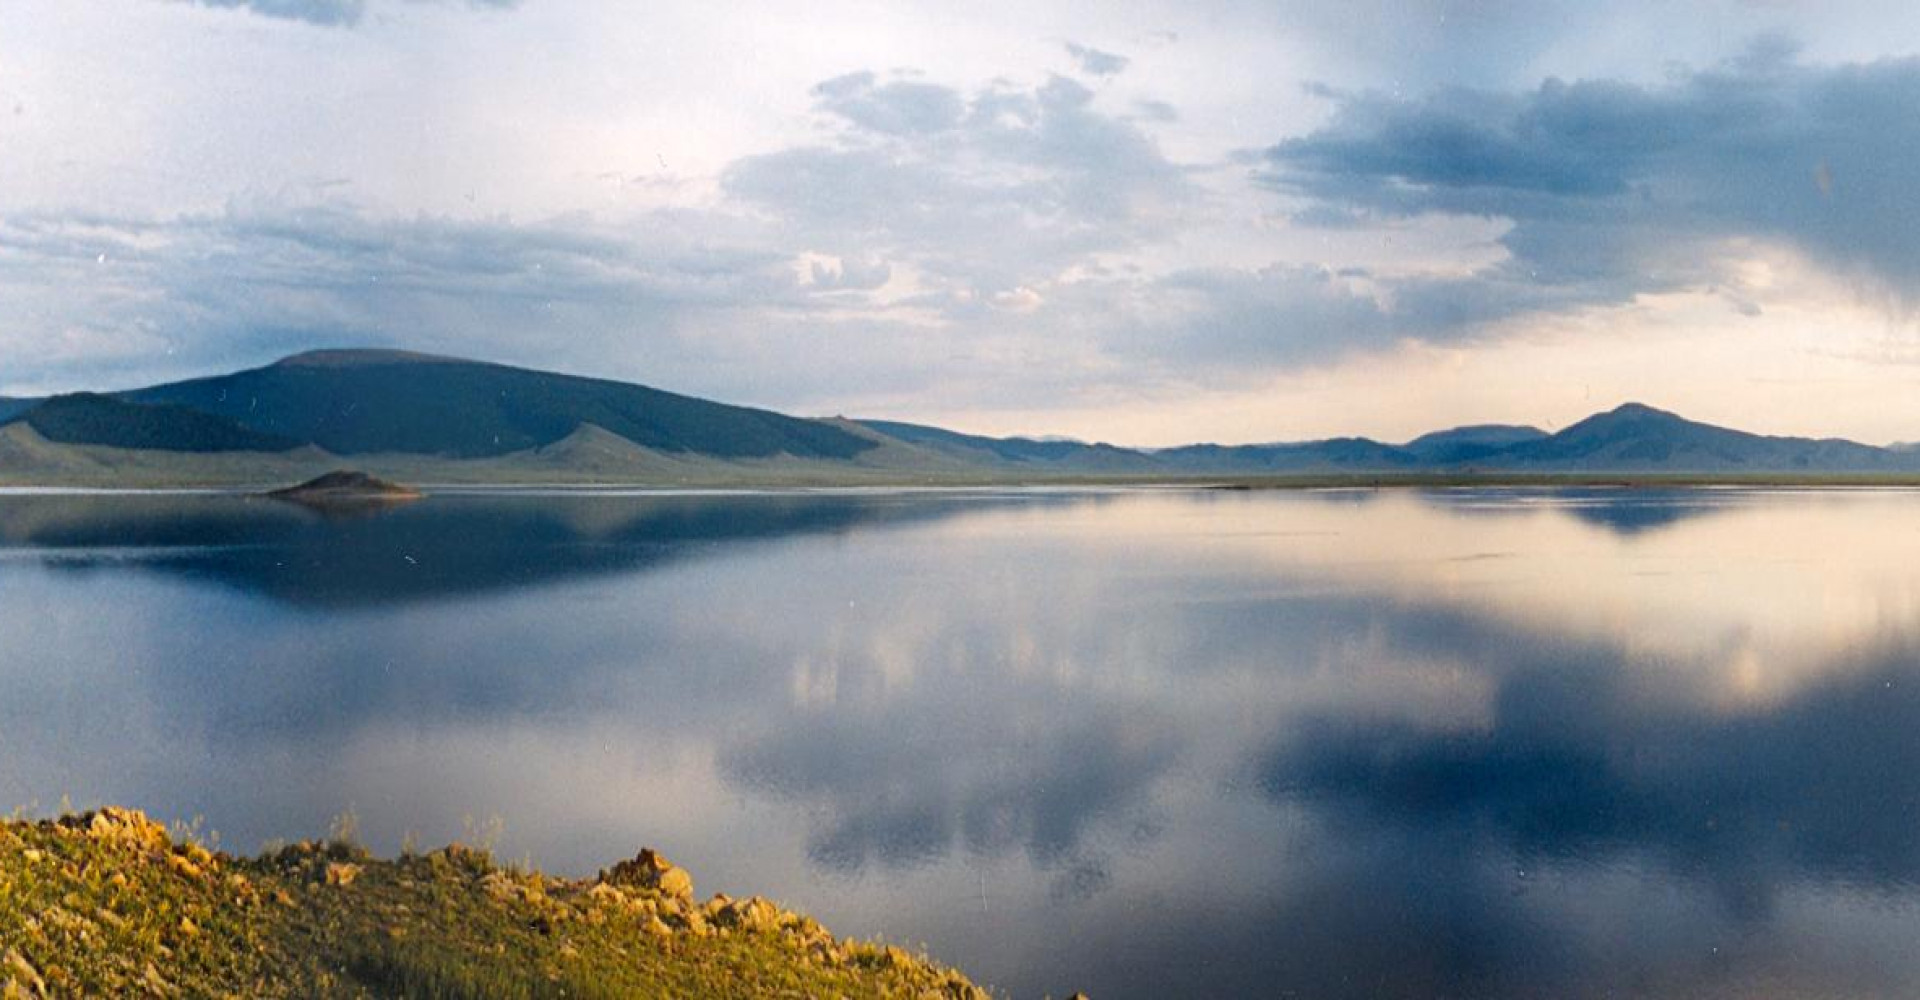 Terkh Tsagaan Lake